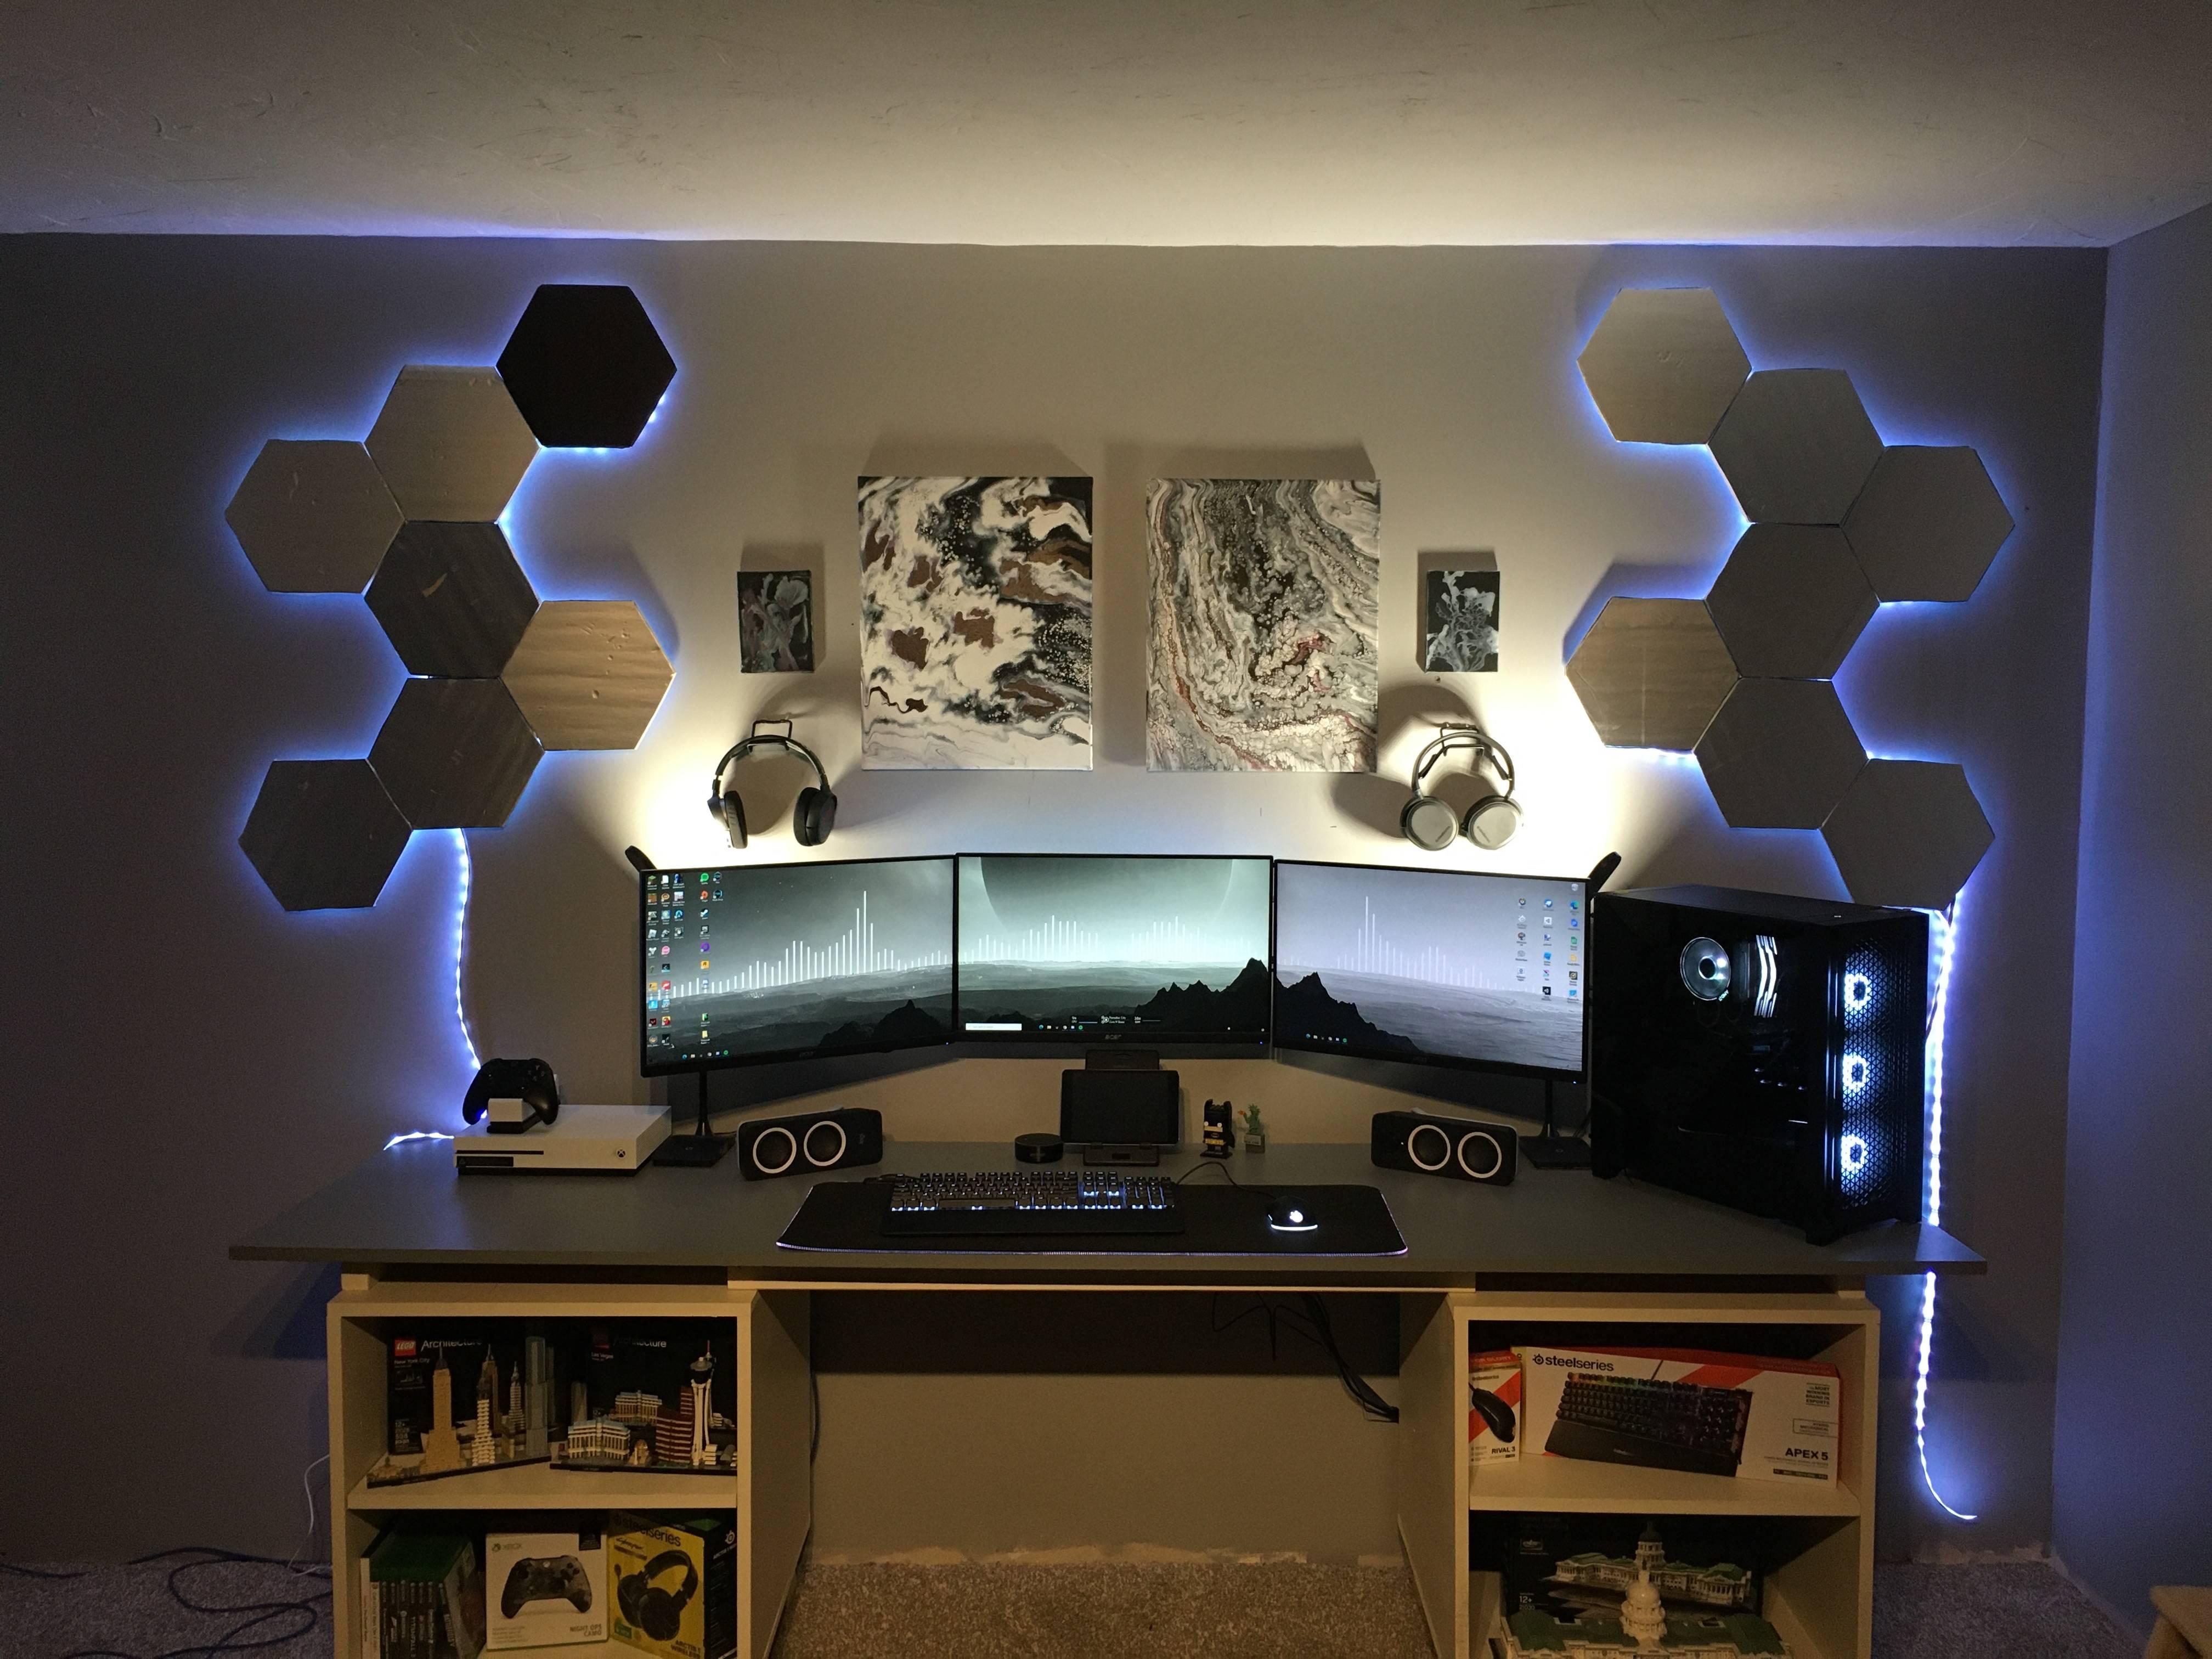 kennethbranowic's Setup - My triple monitor gaming setup   Scooget